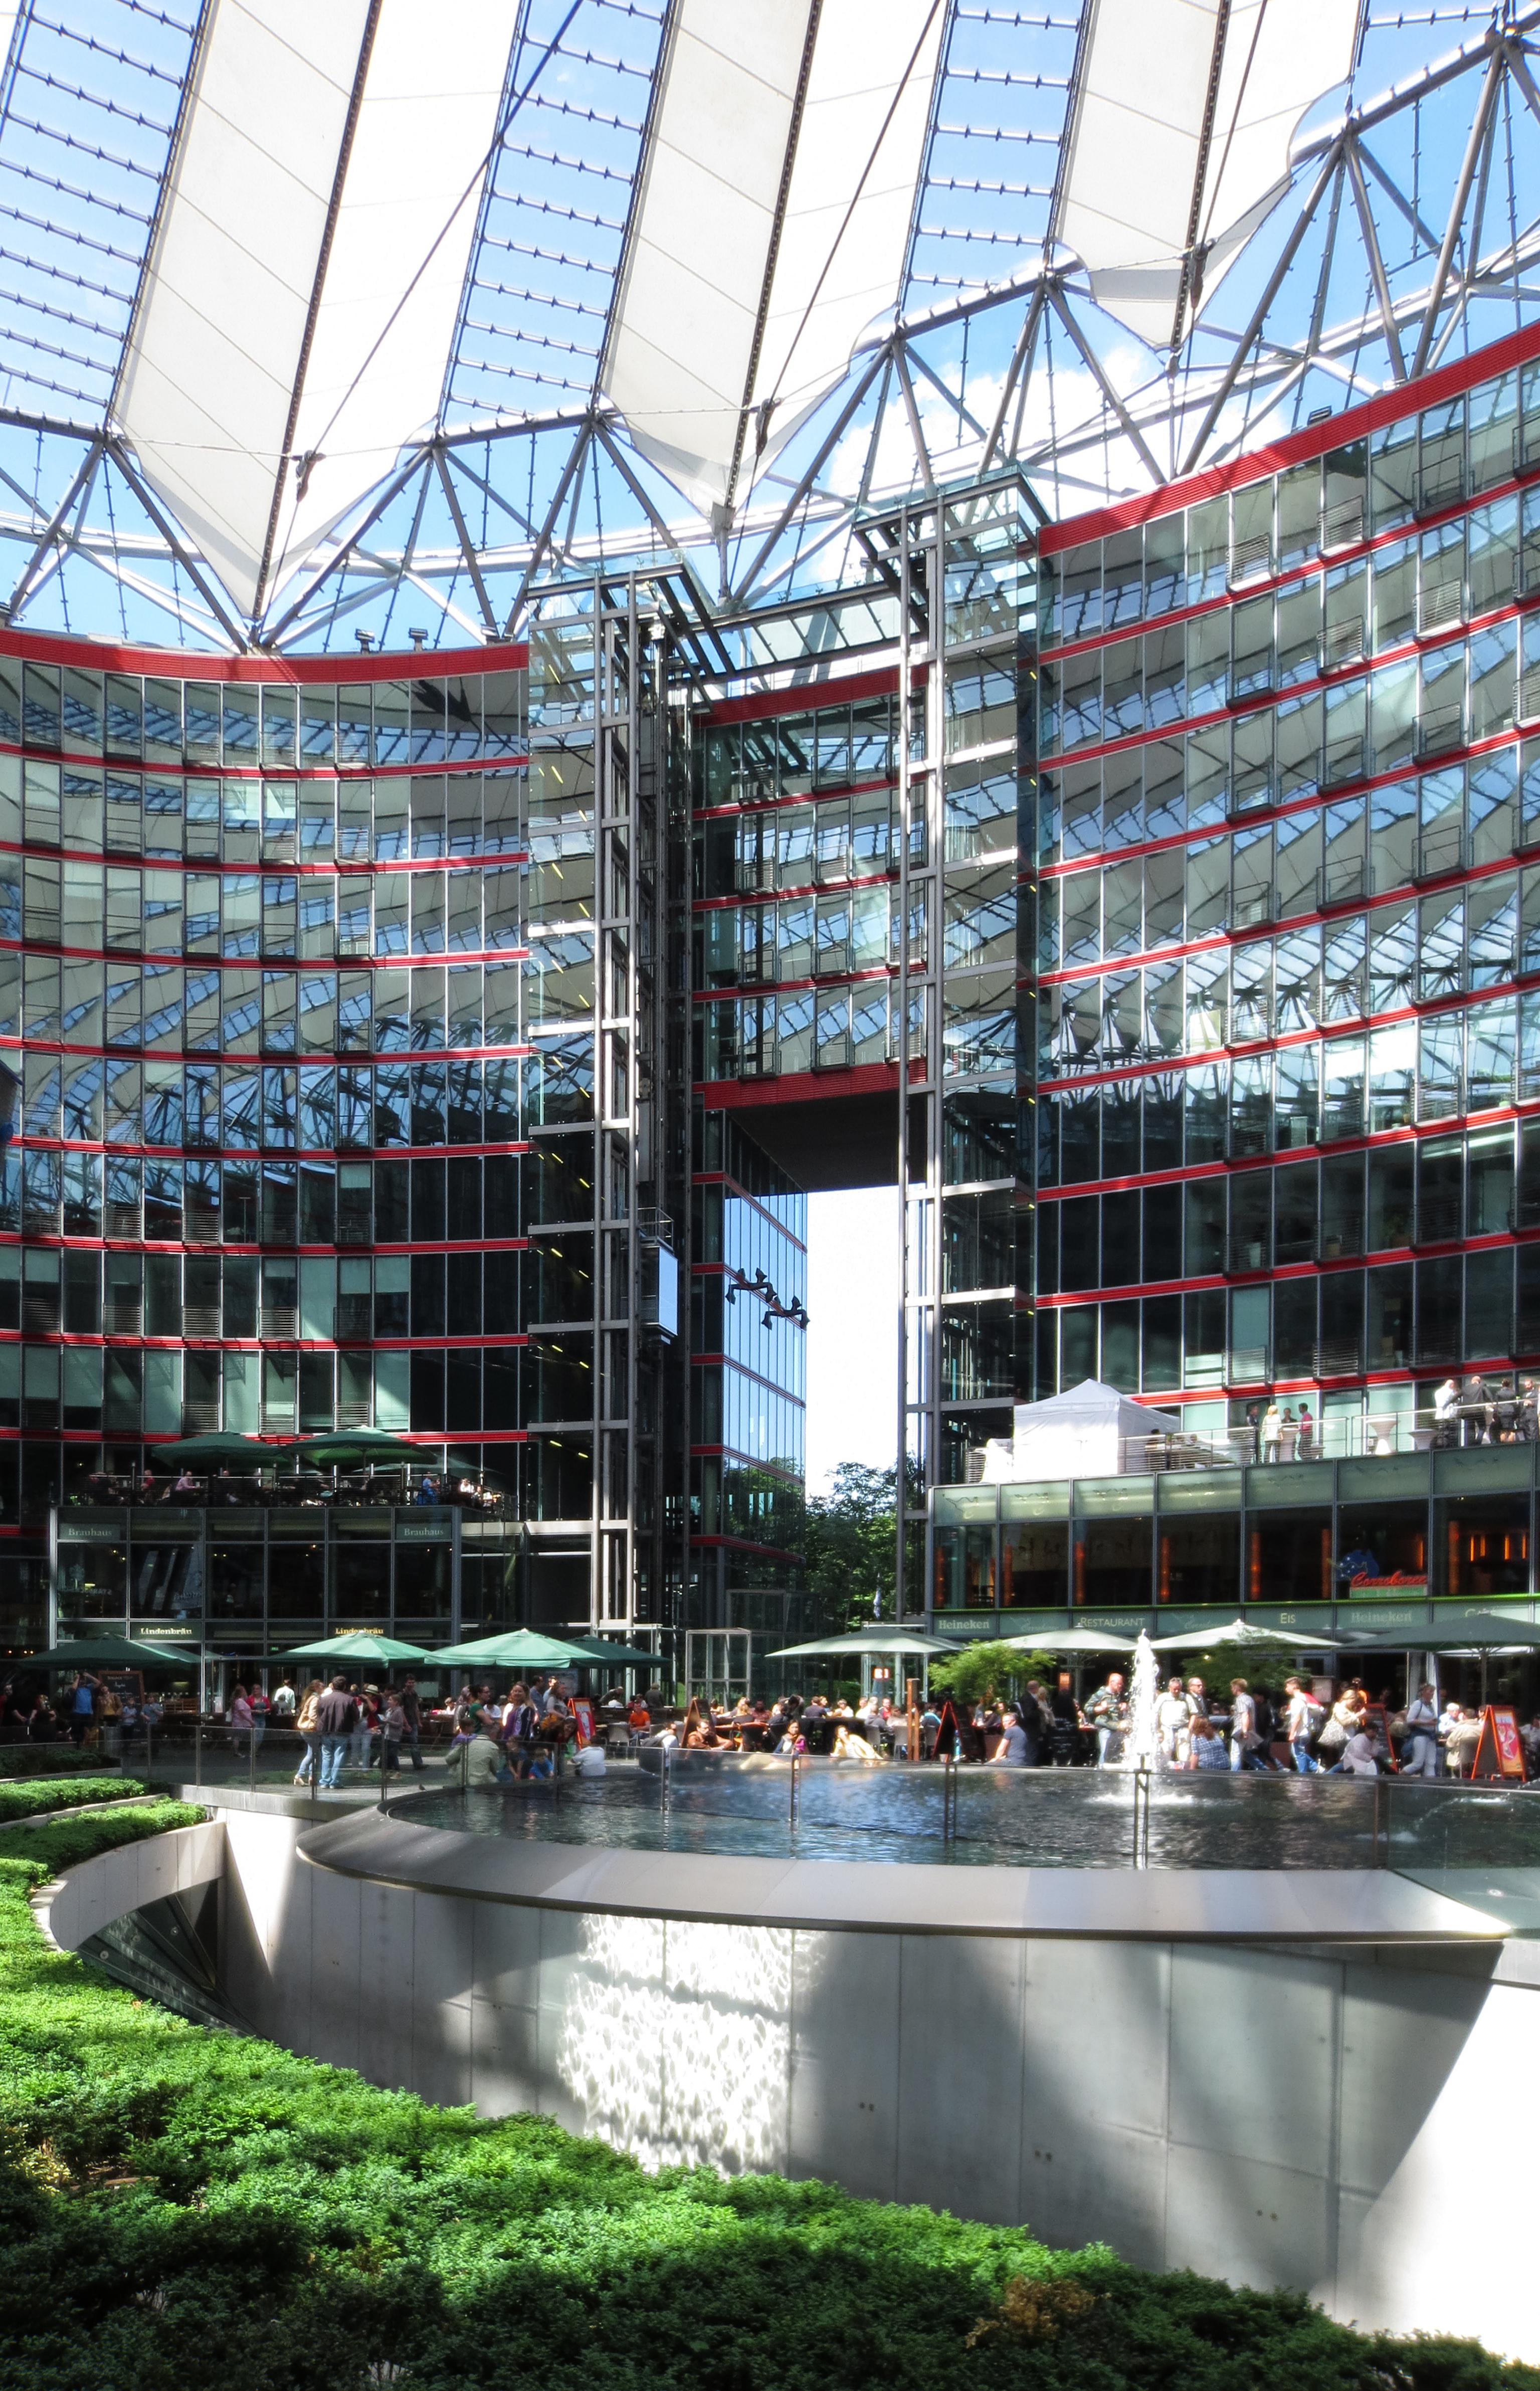 ✅ Sony Center - Data, Photos & Plans - WikiArquitectura